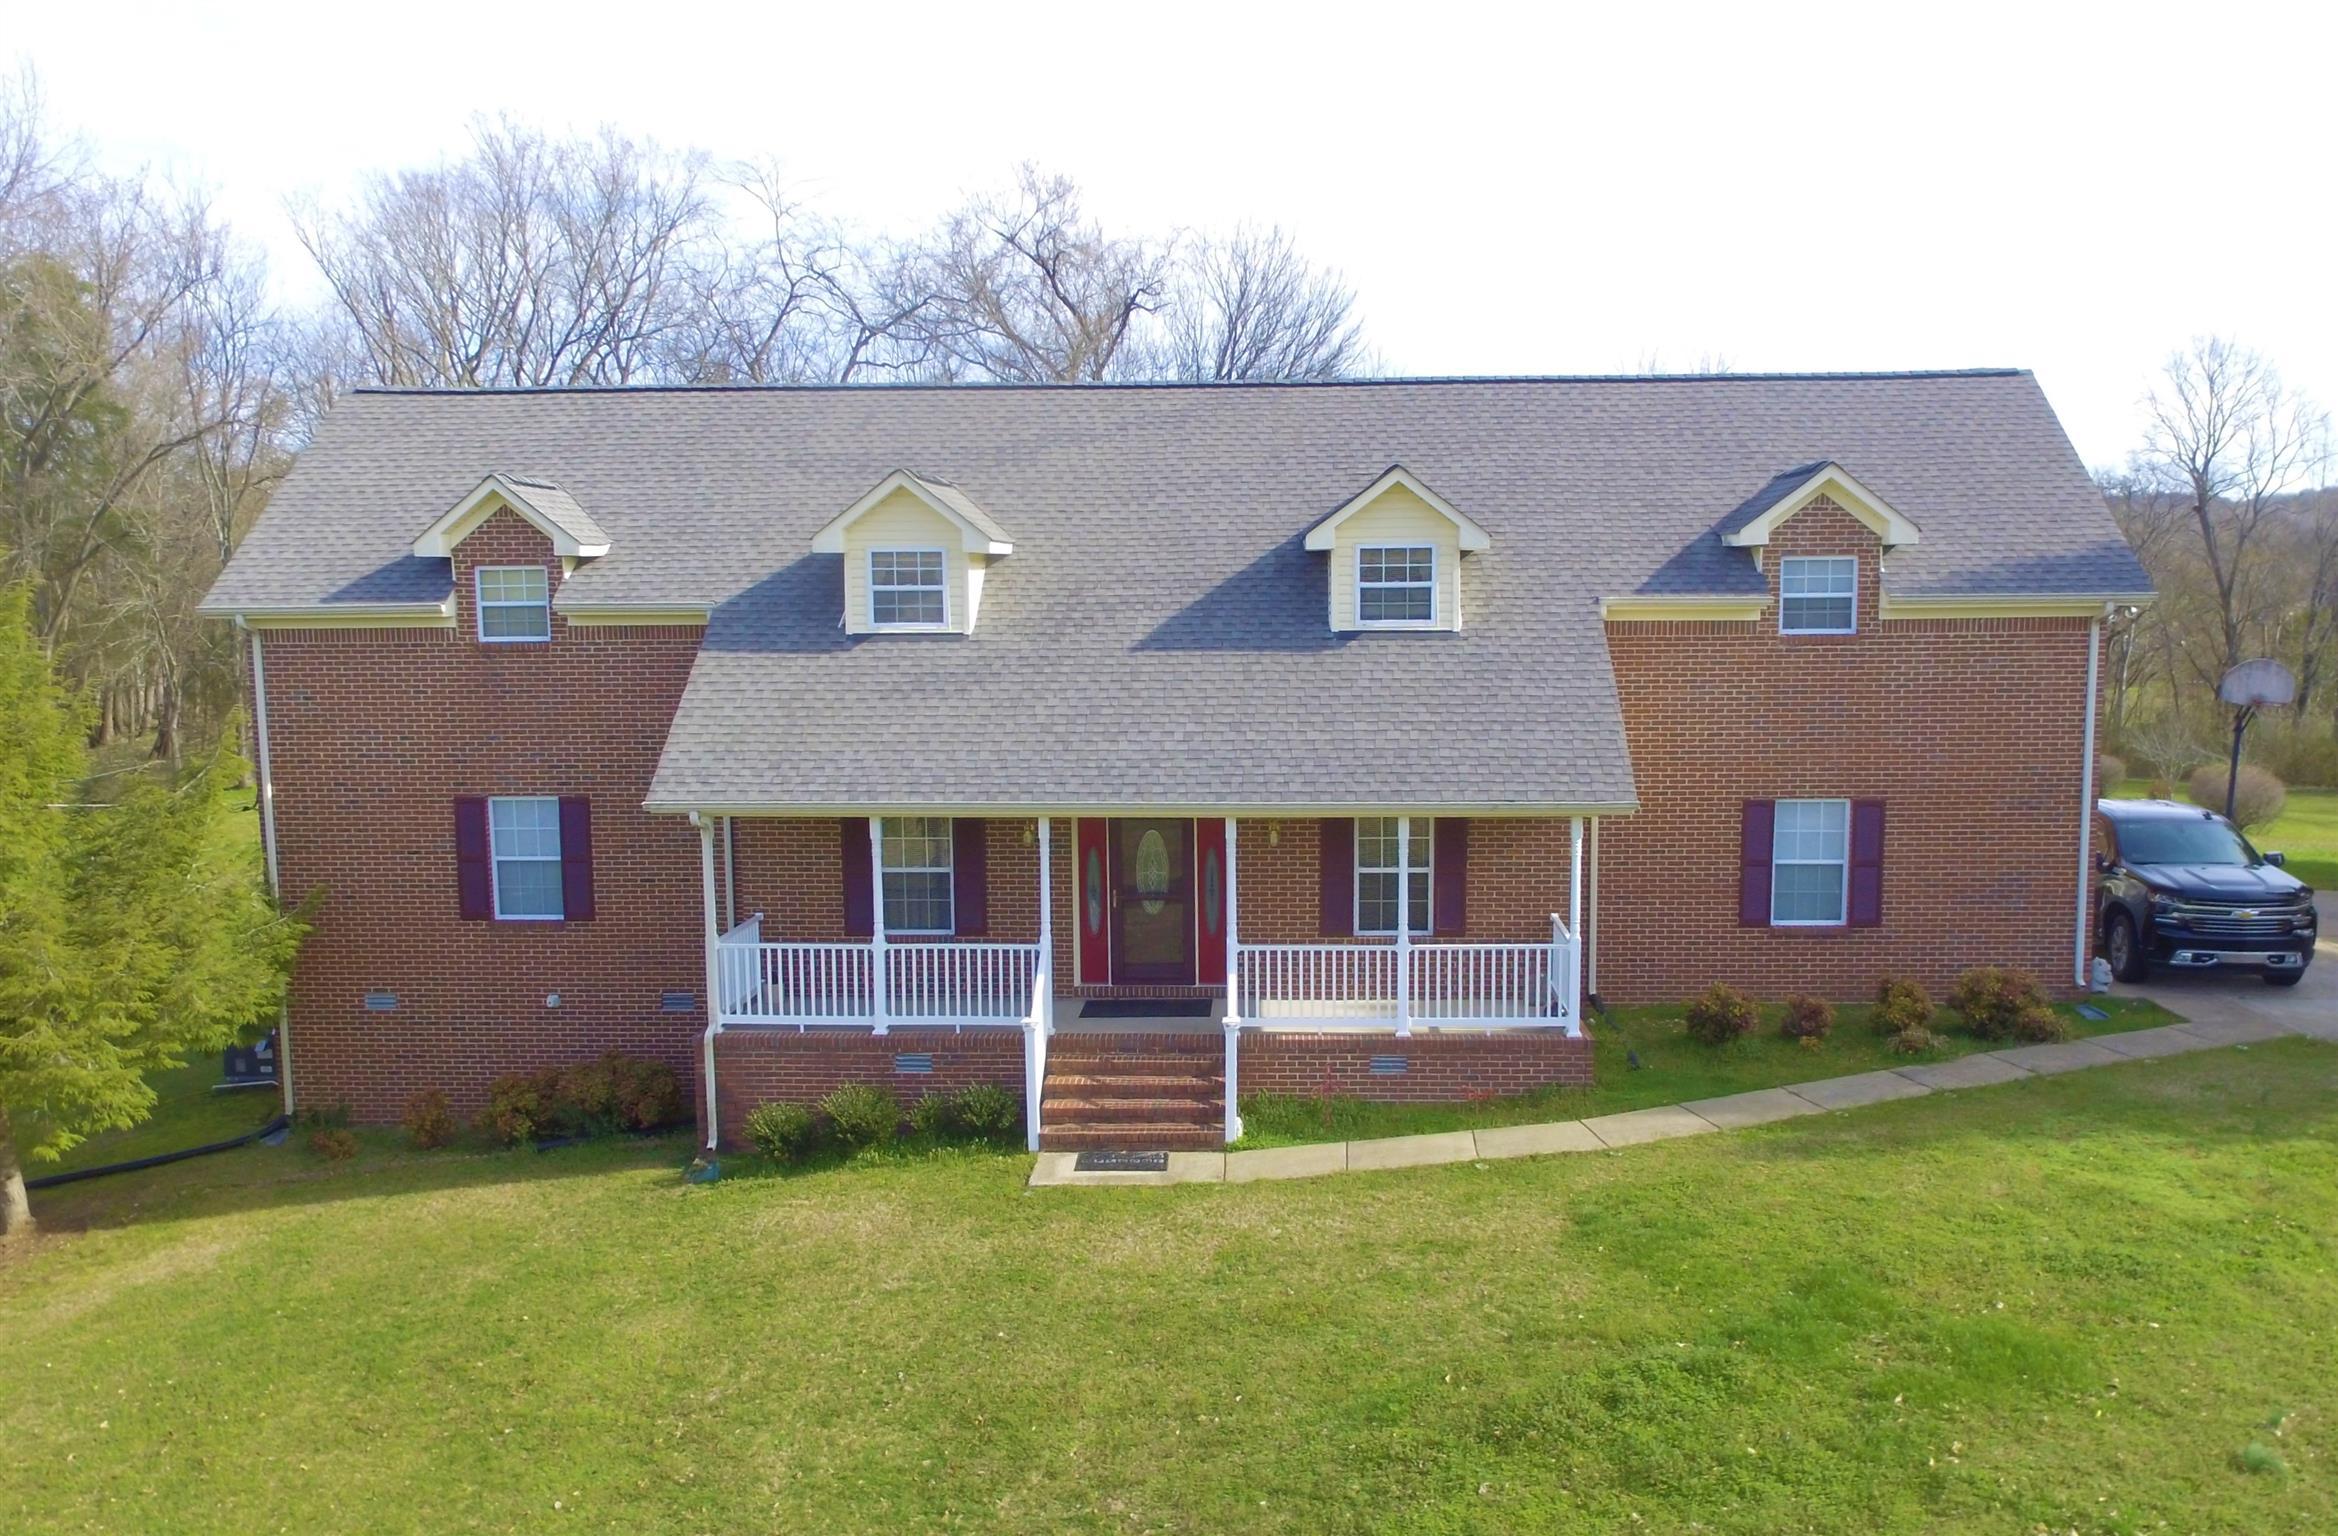 933 Bonnie Blue Ln, Columbia, TN 38401 - Columbia, TN real estate listing